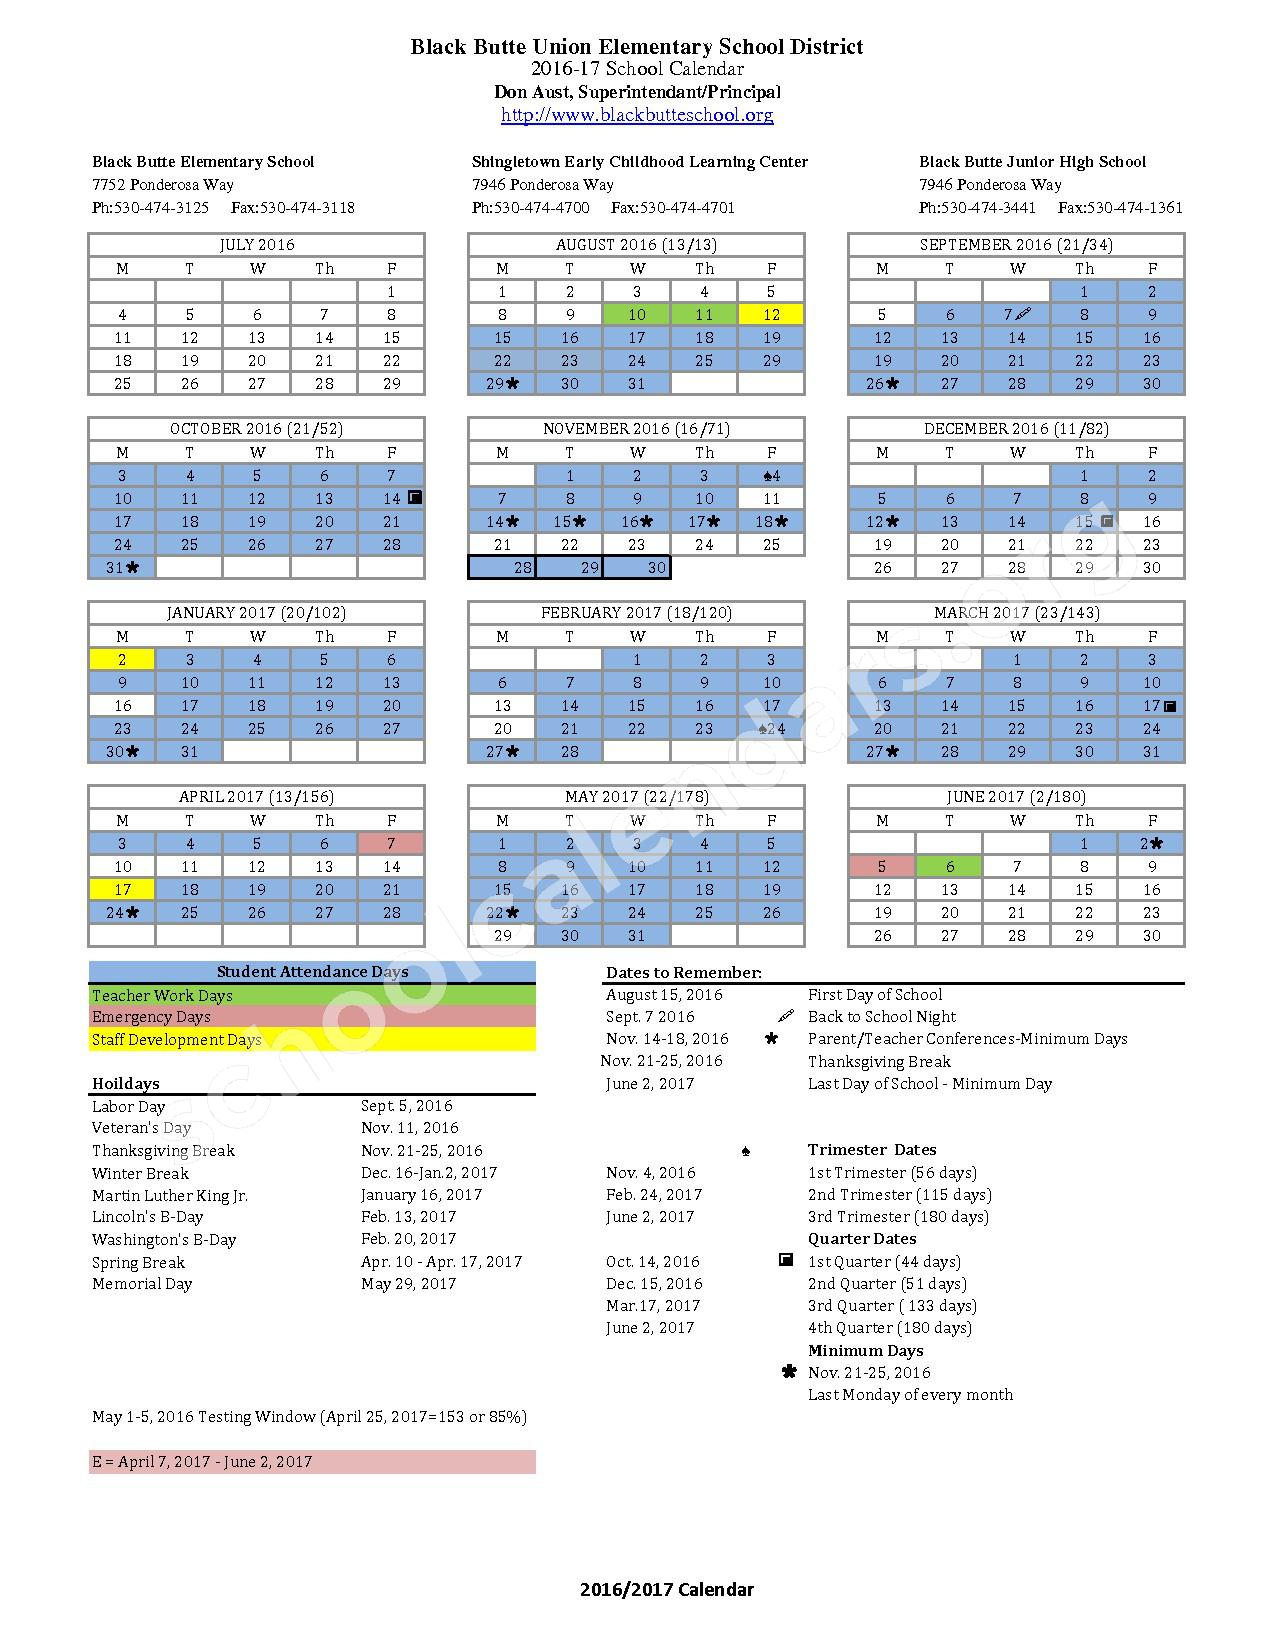 2016 - 2017 School Calendar – Black Butte Union Elementary School District – page 1